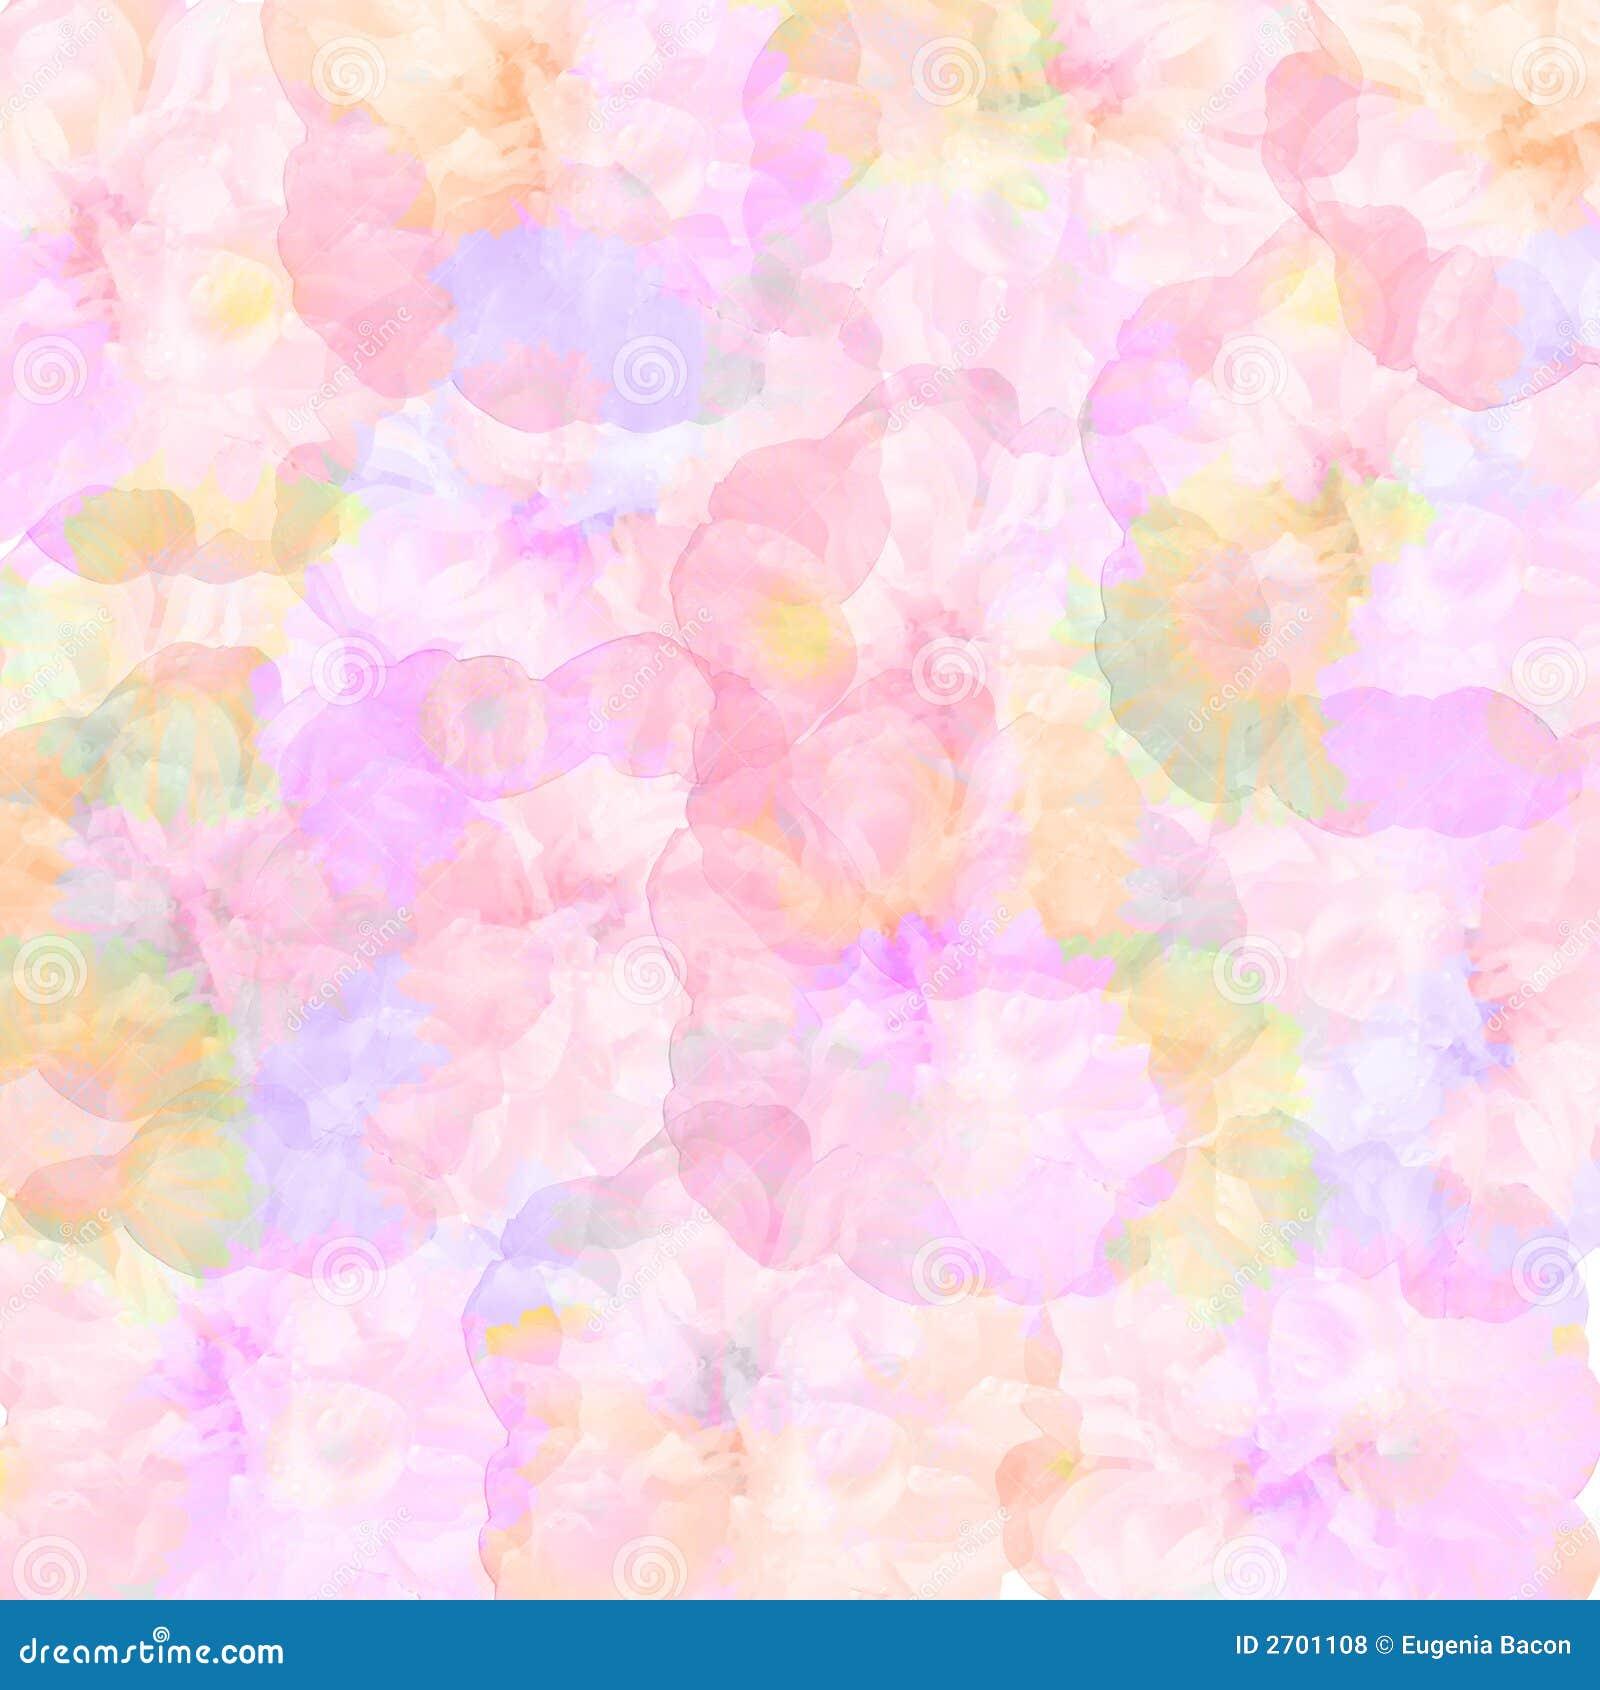 soft rainbow coloured roses royalty free stock photos